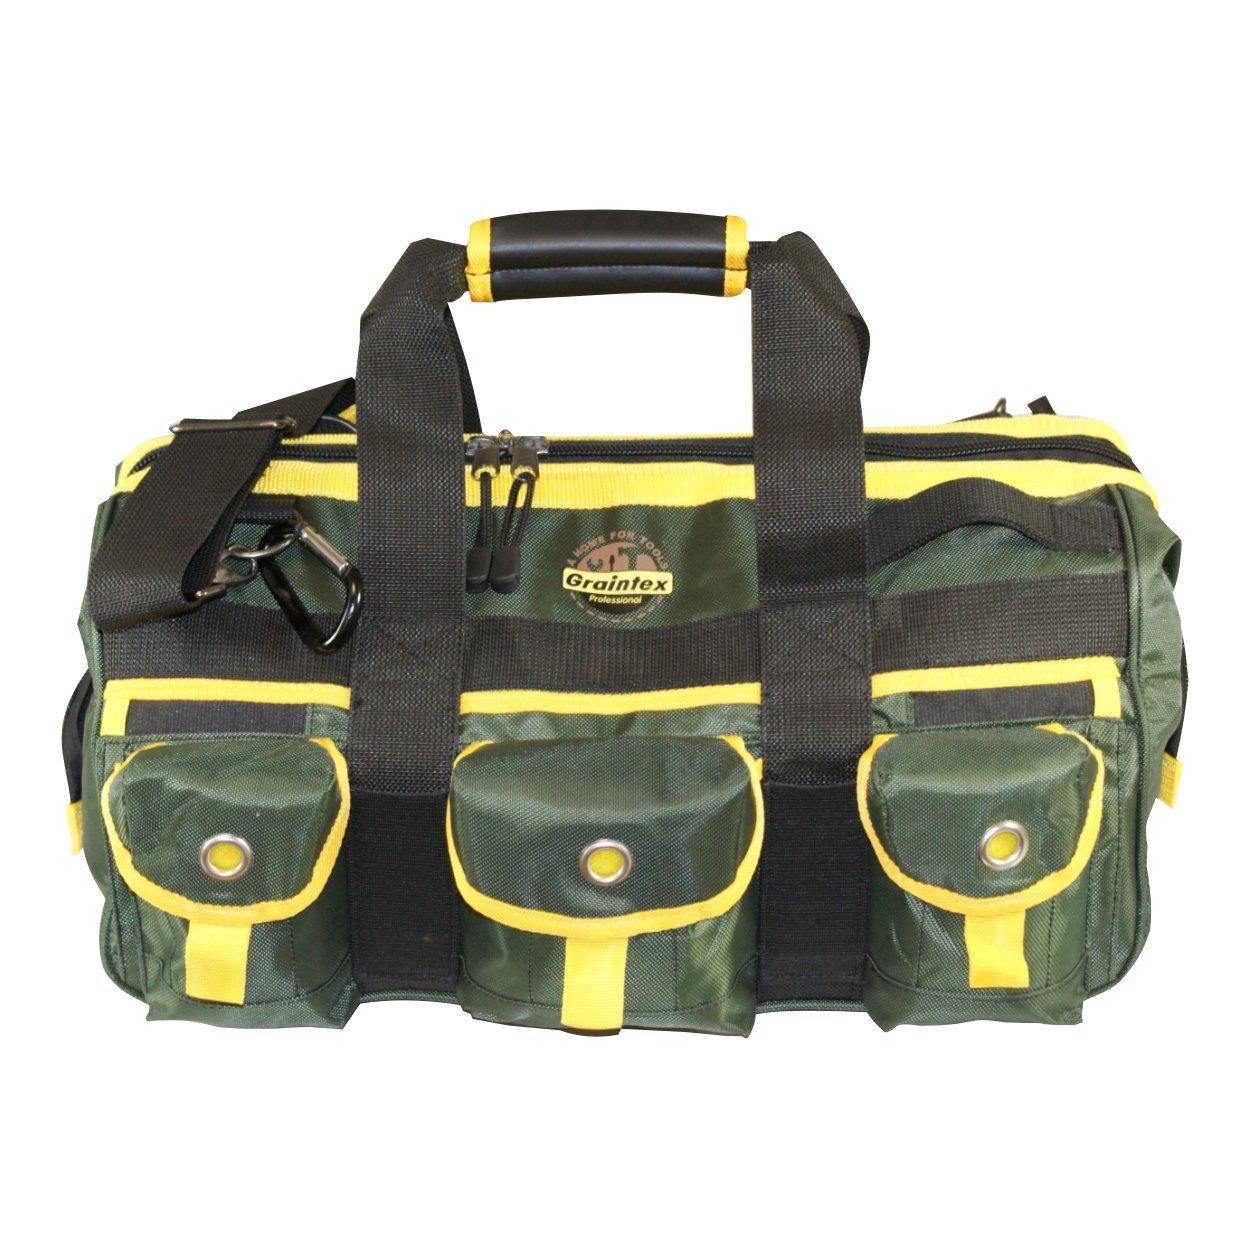 Graintex NB1218 Contractor's Tool Bag 18 Inch